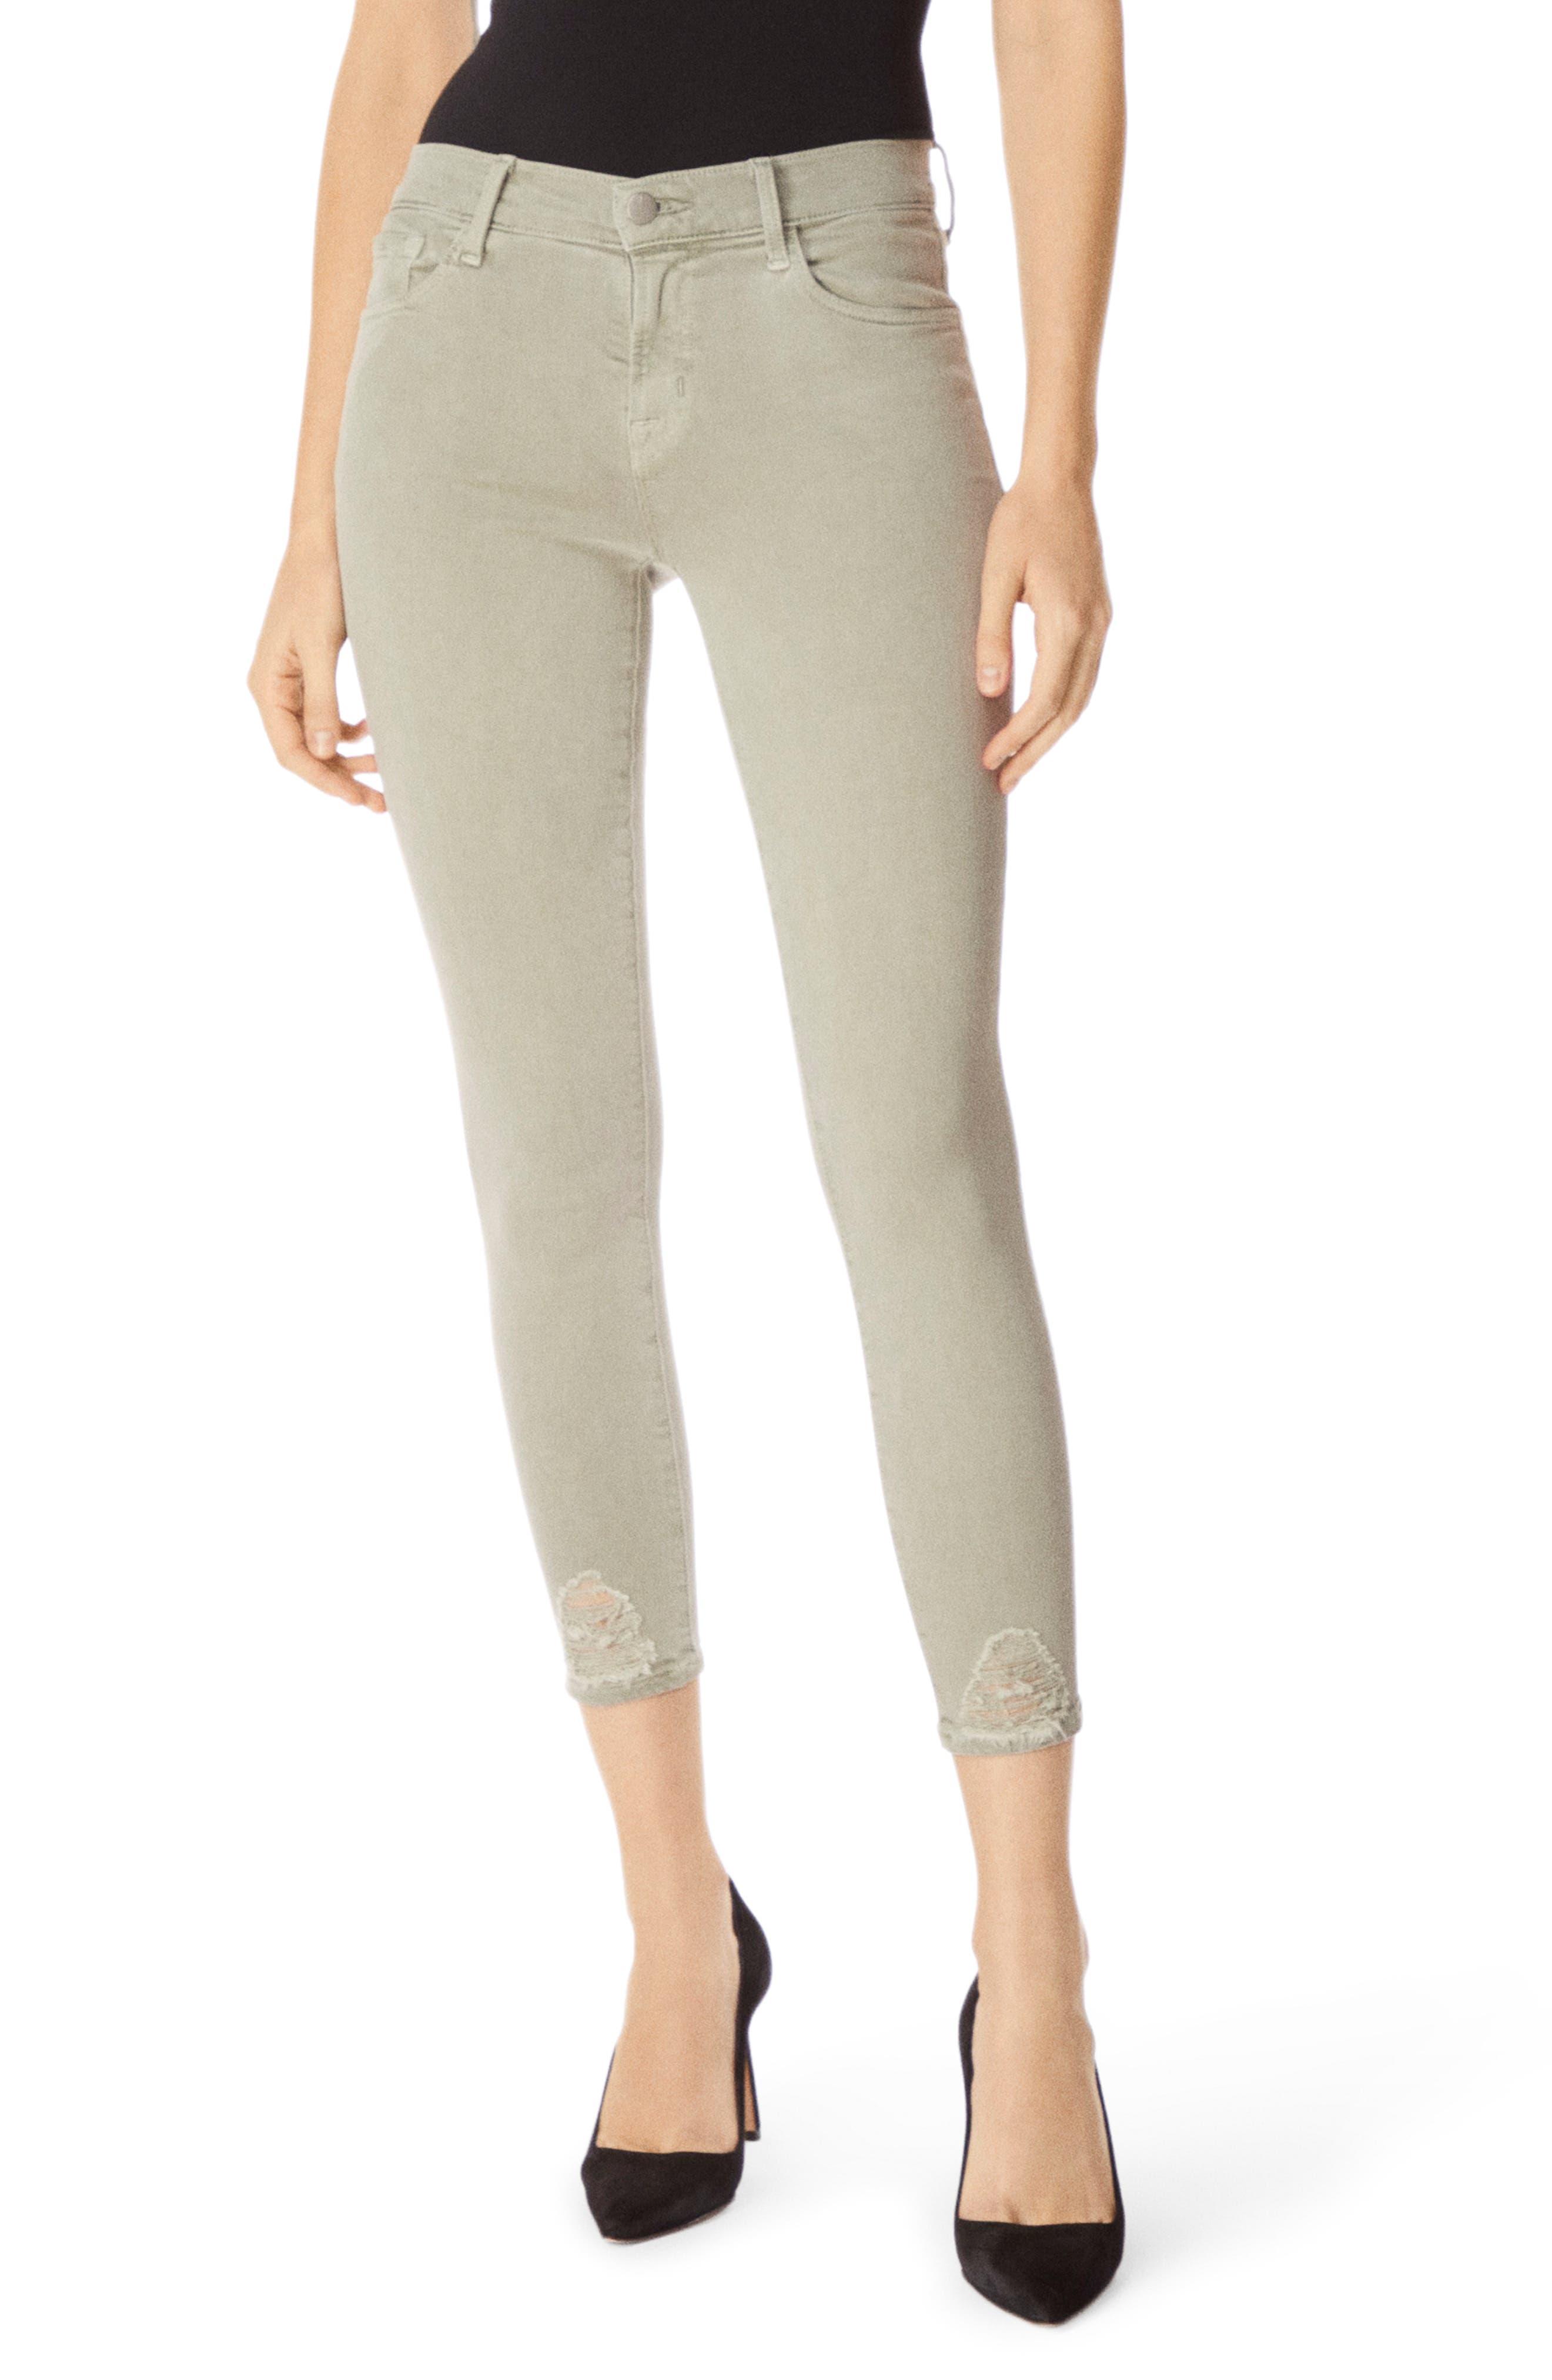 J BRAND, 835 Capri Skinny Jeans, Main thumbnail 1, color, FADED GIBSON DESTRUCT